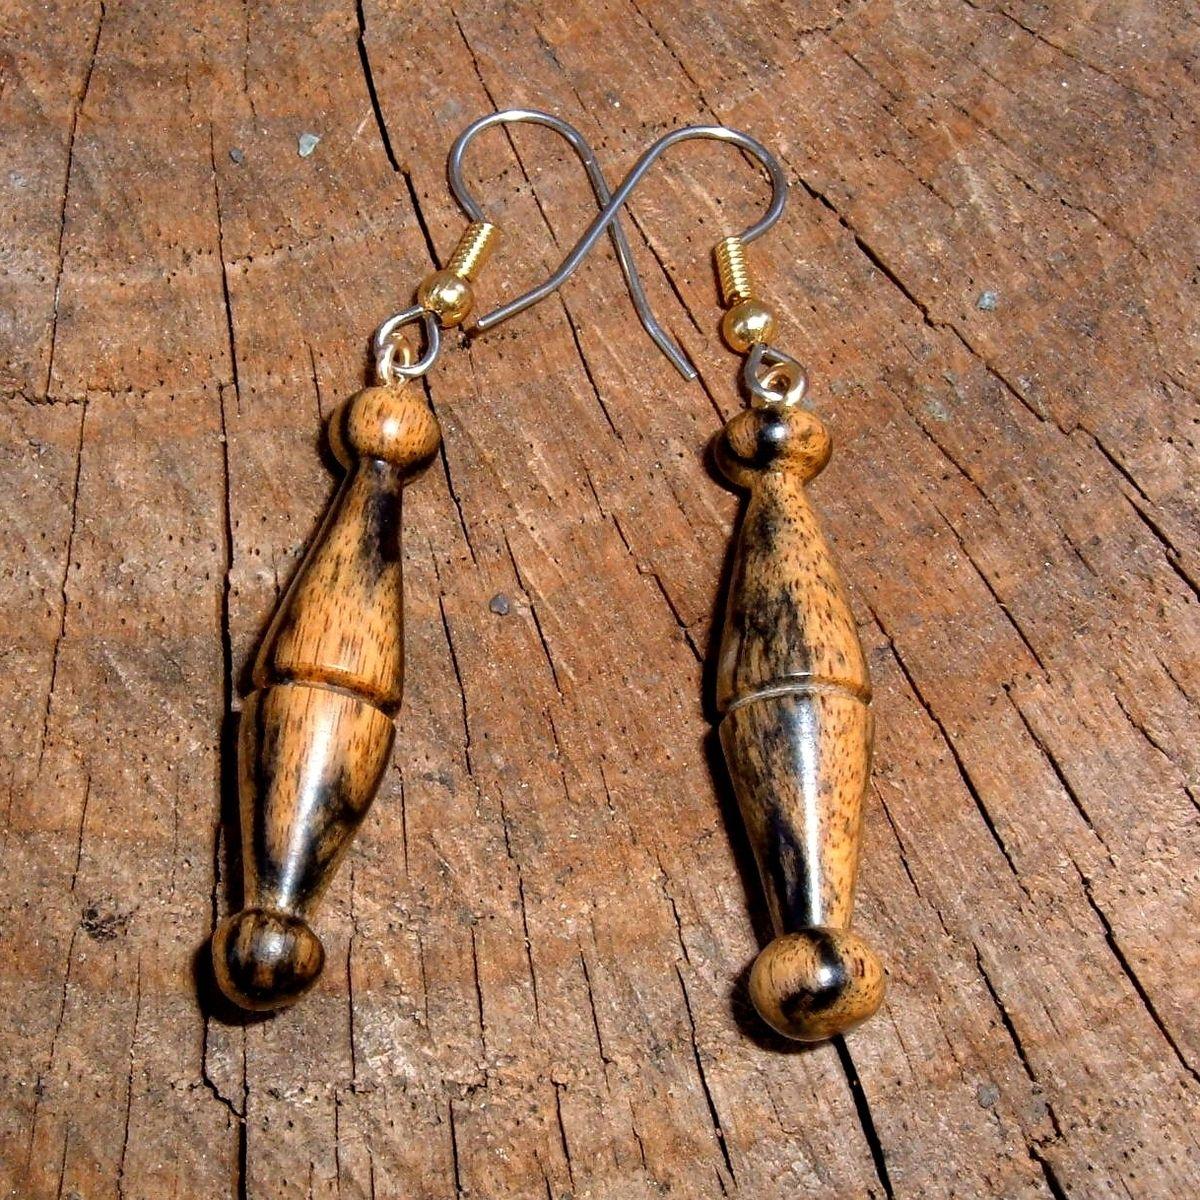 Custom Made Turned Wood Earrings Of Black And White Ebony, Very Light